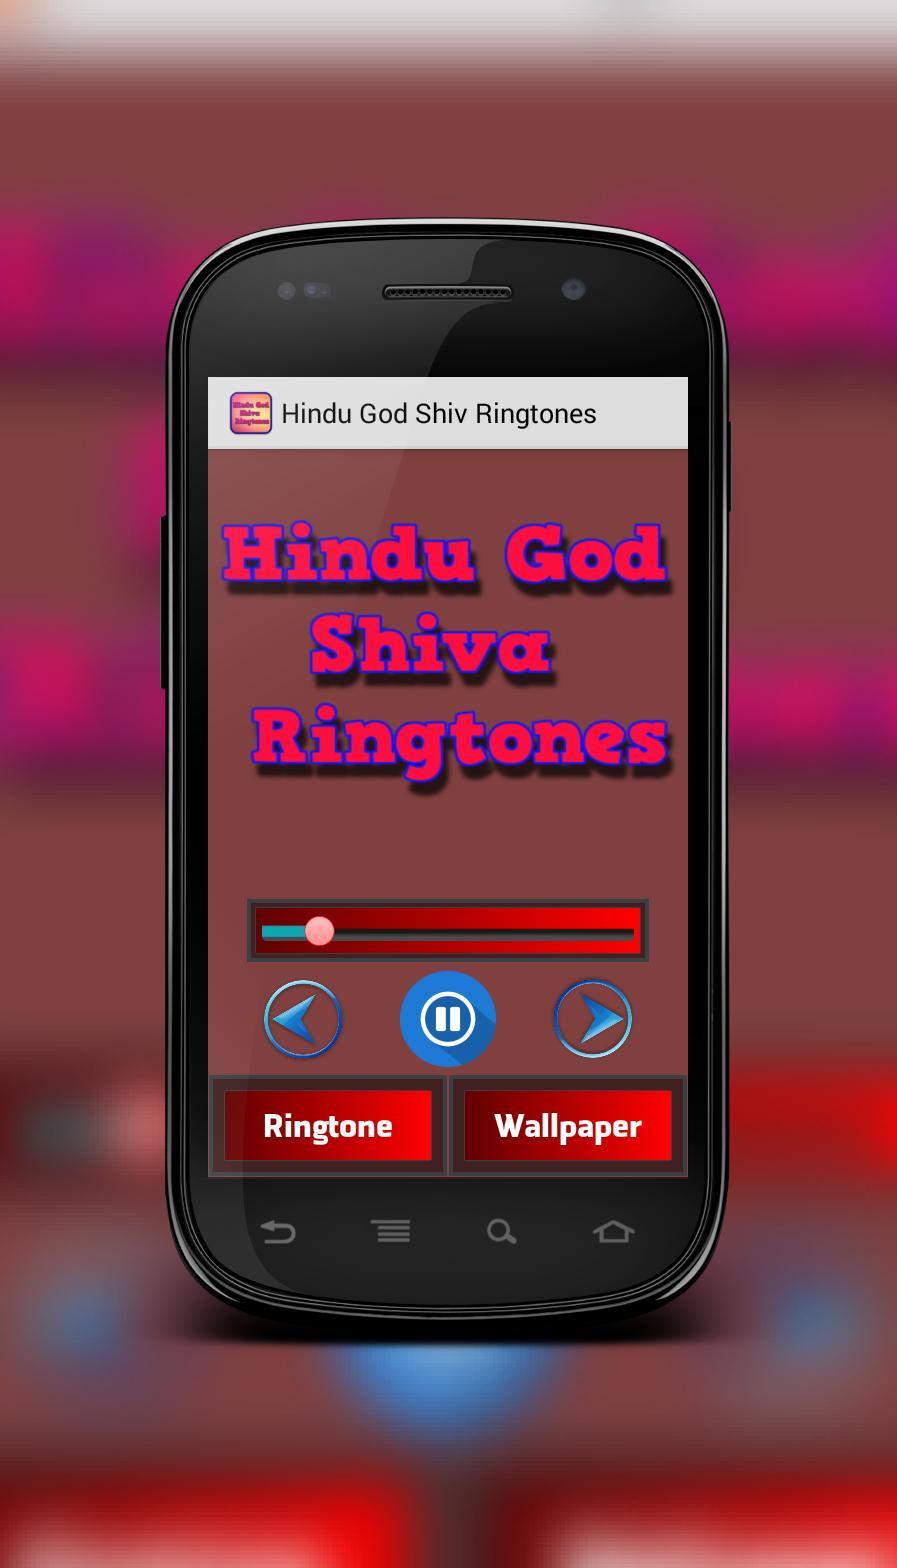 Hindu God Shiv Ringtones for Android - APK Download